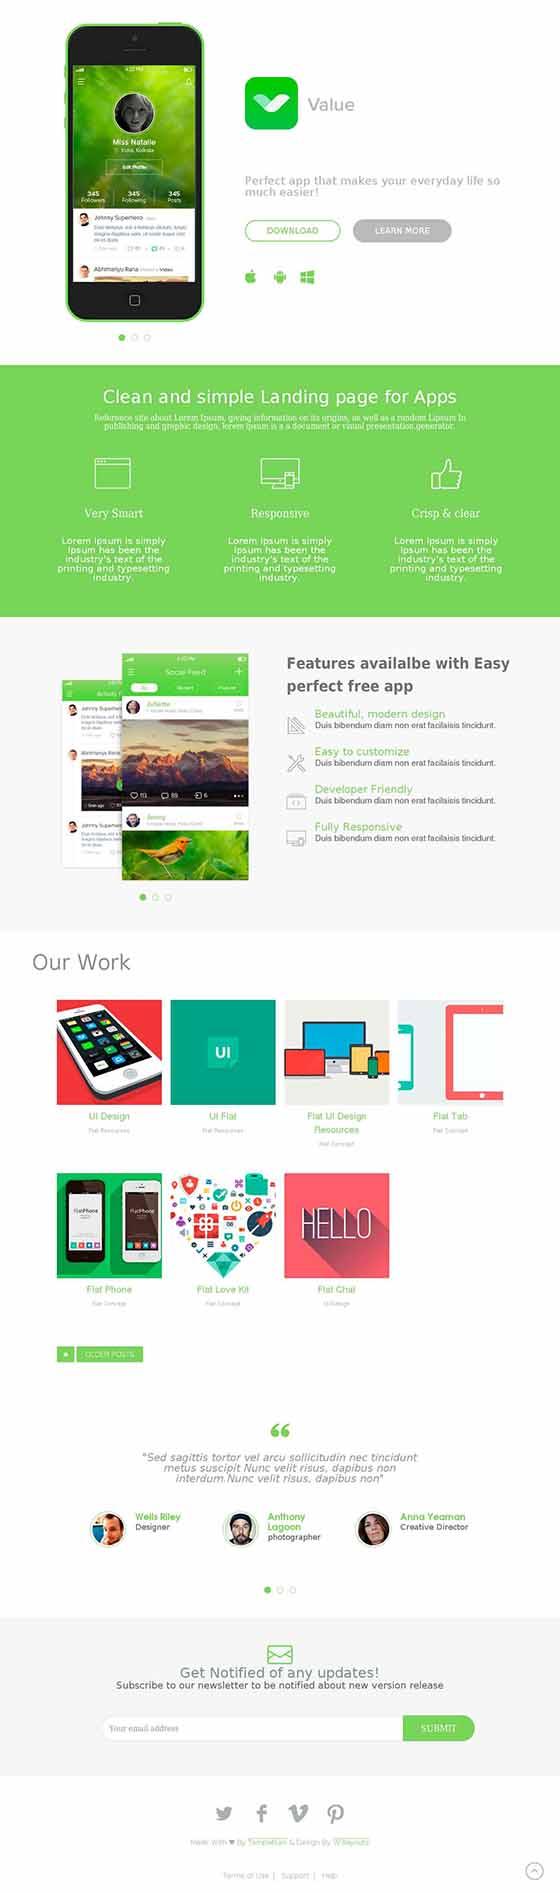 Plantillas responsive para crear paginas web usando Blogger